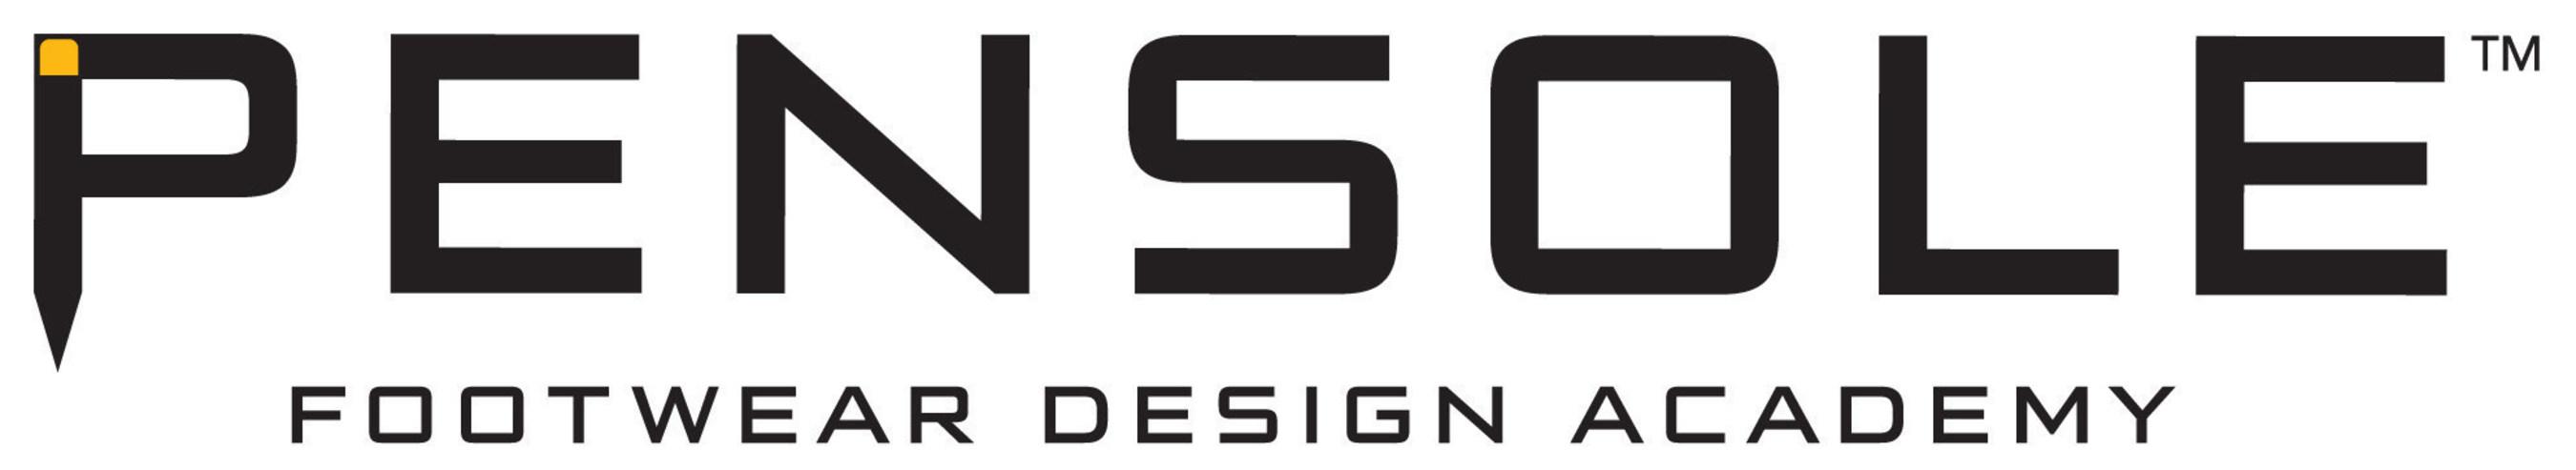 Pensole Footwear Design Academy logo